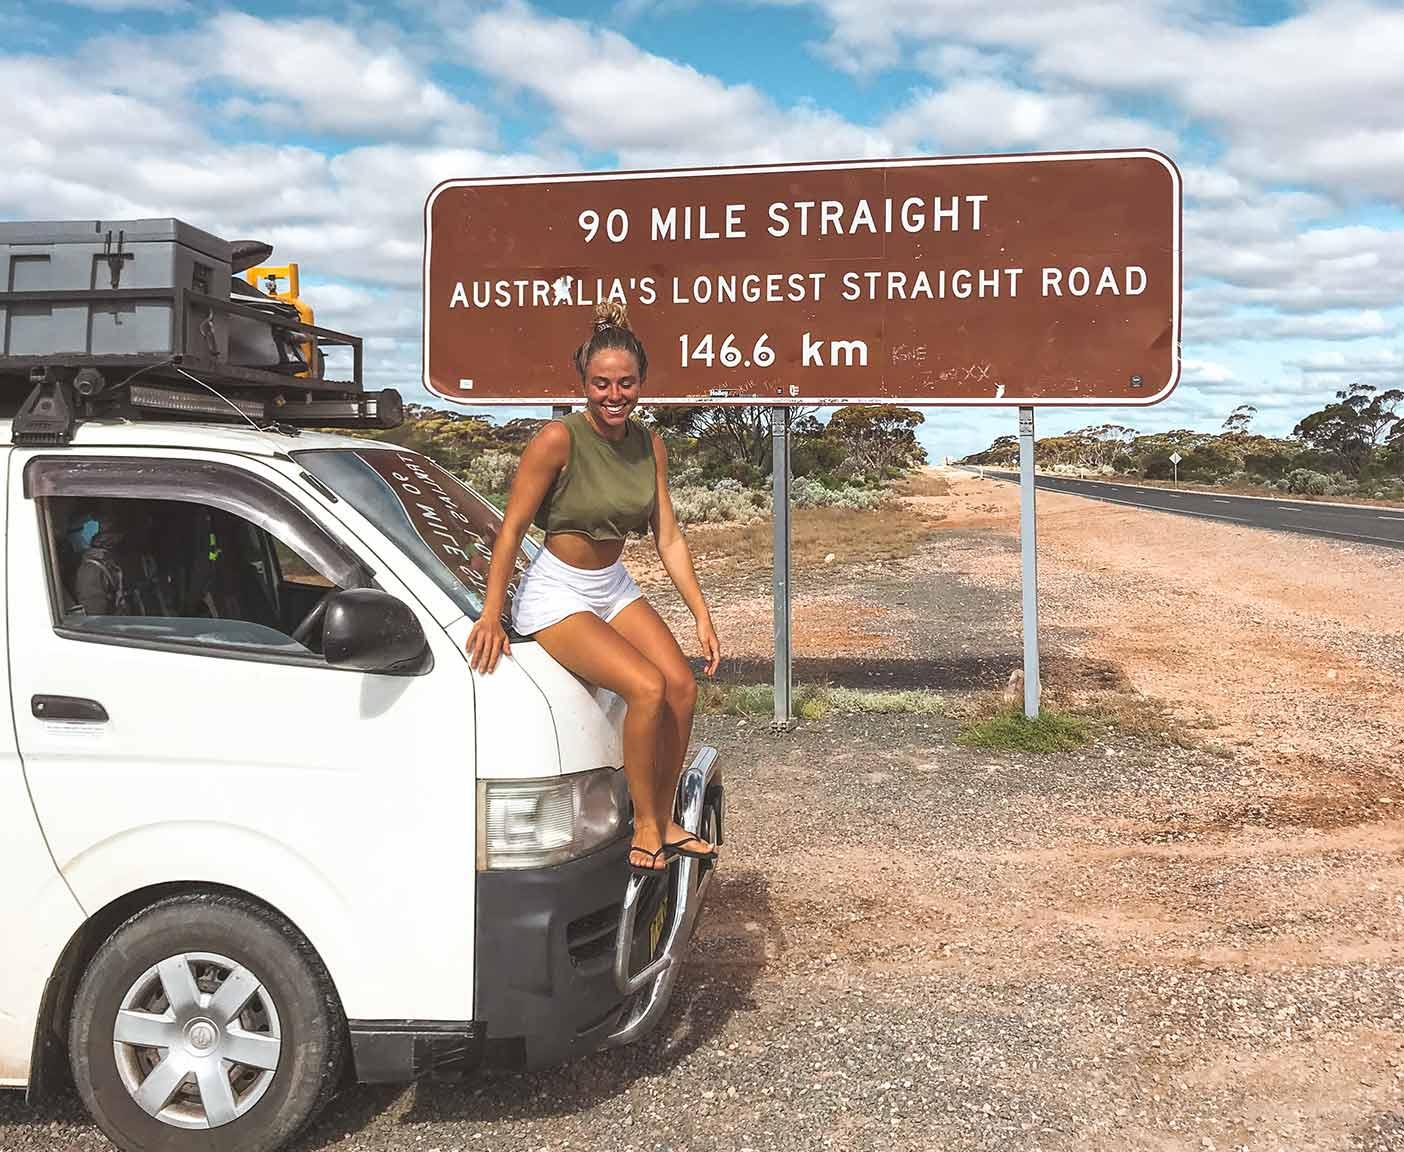 Toyota-hiace-camper-4x4-van-camping-australia-vanlife-van-for-rent